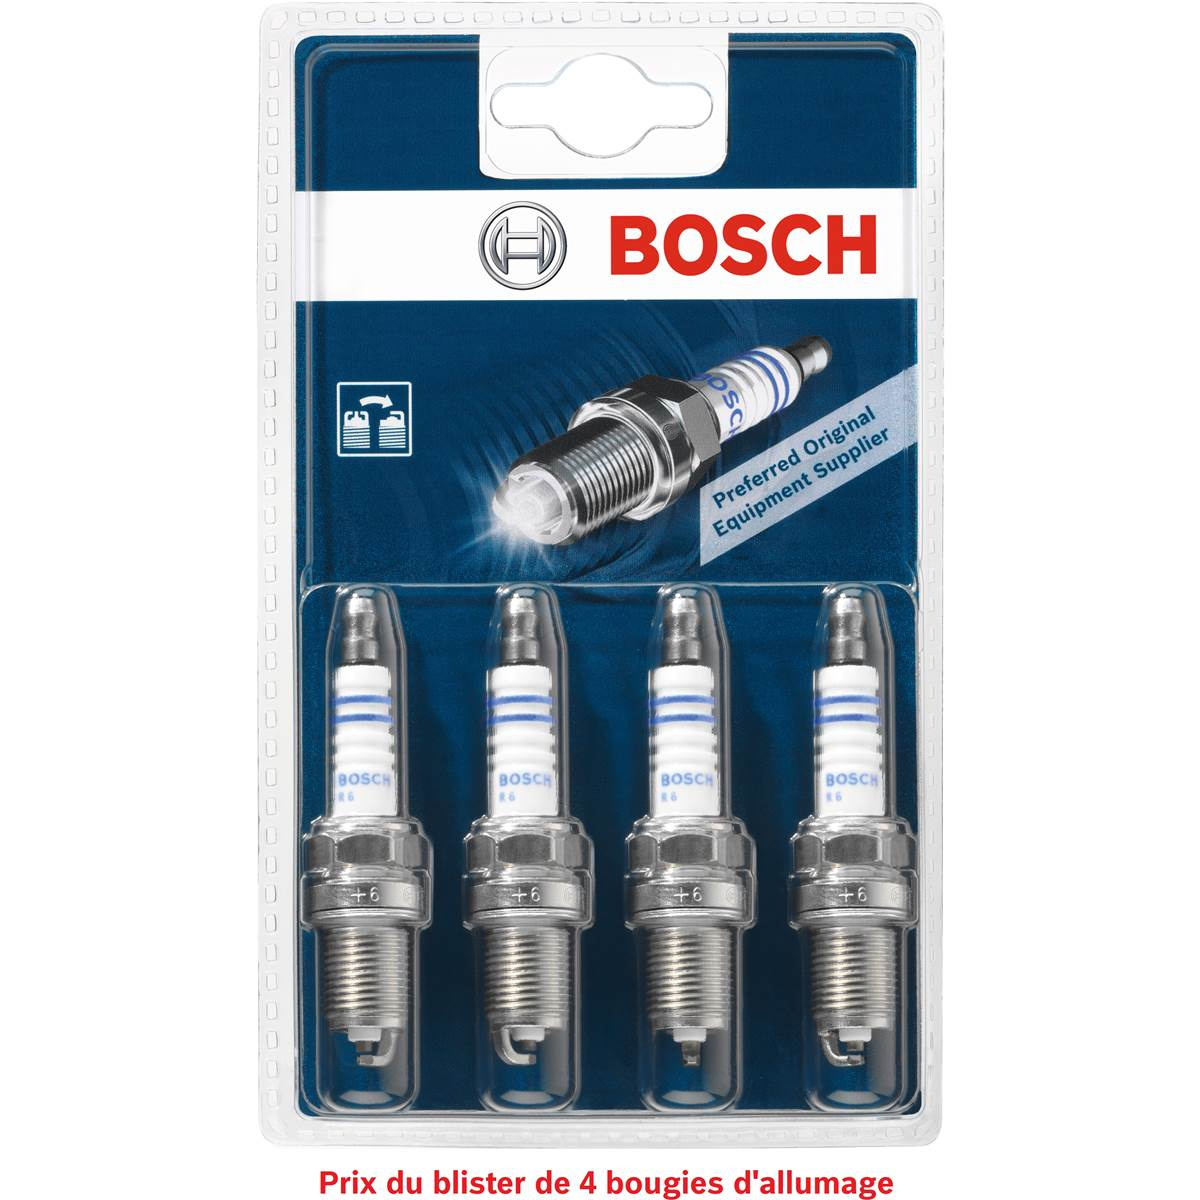 Bougies d'allumage Bosch N°5